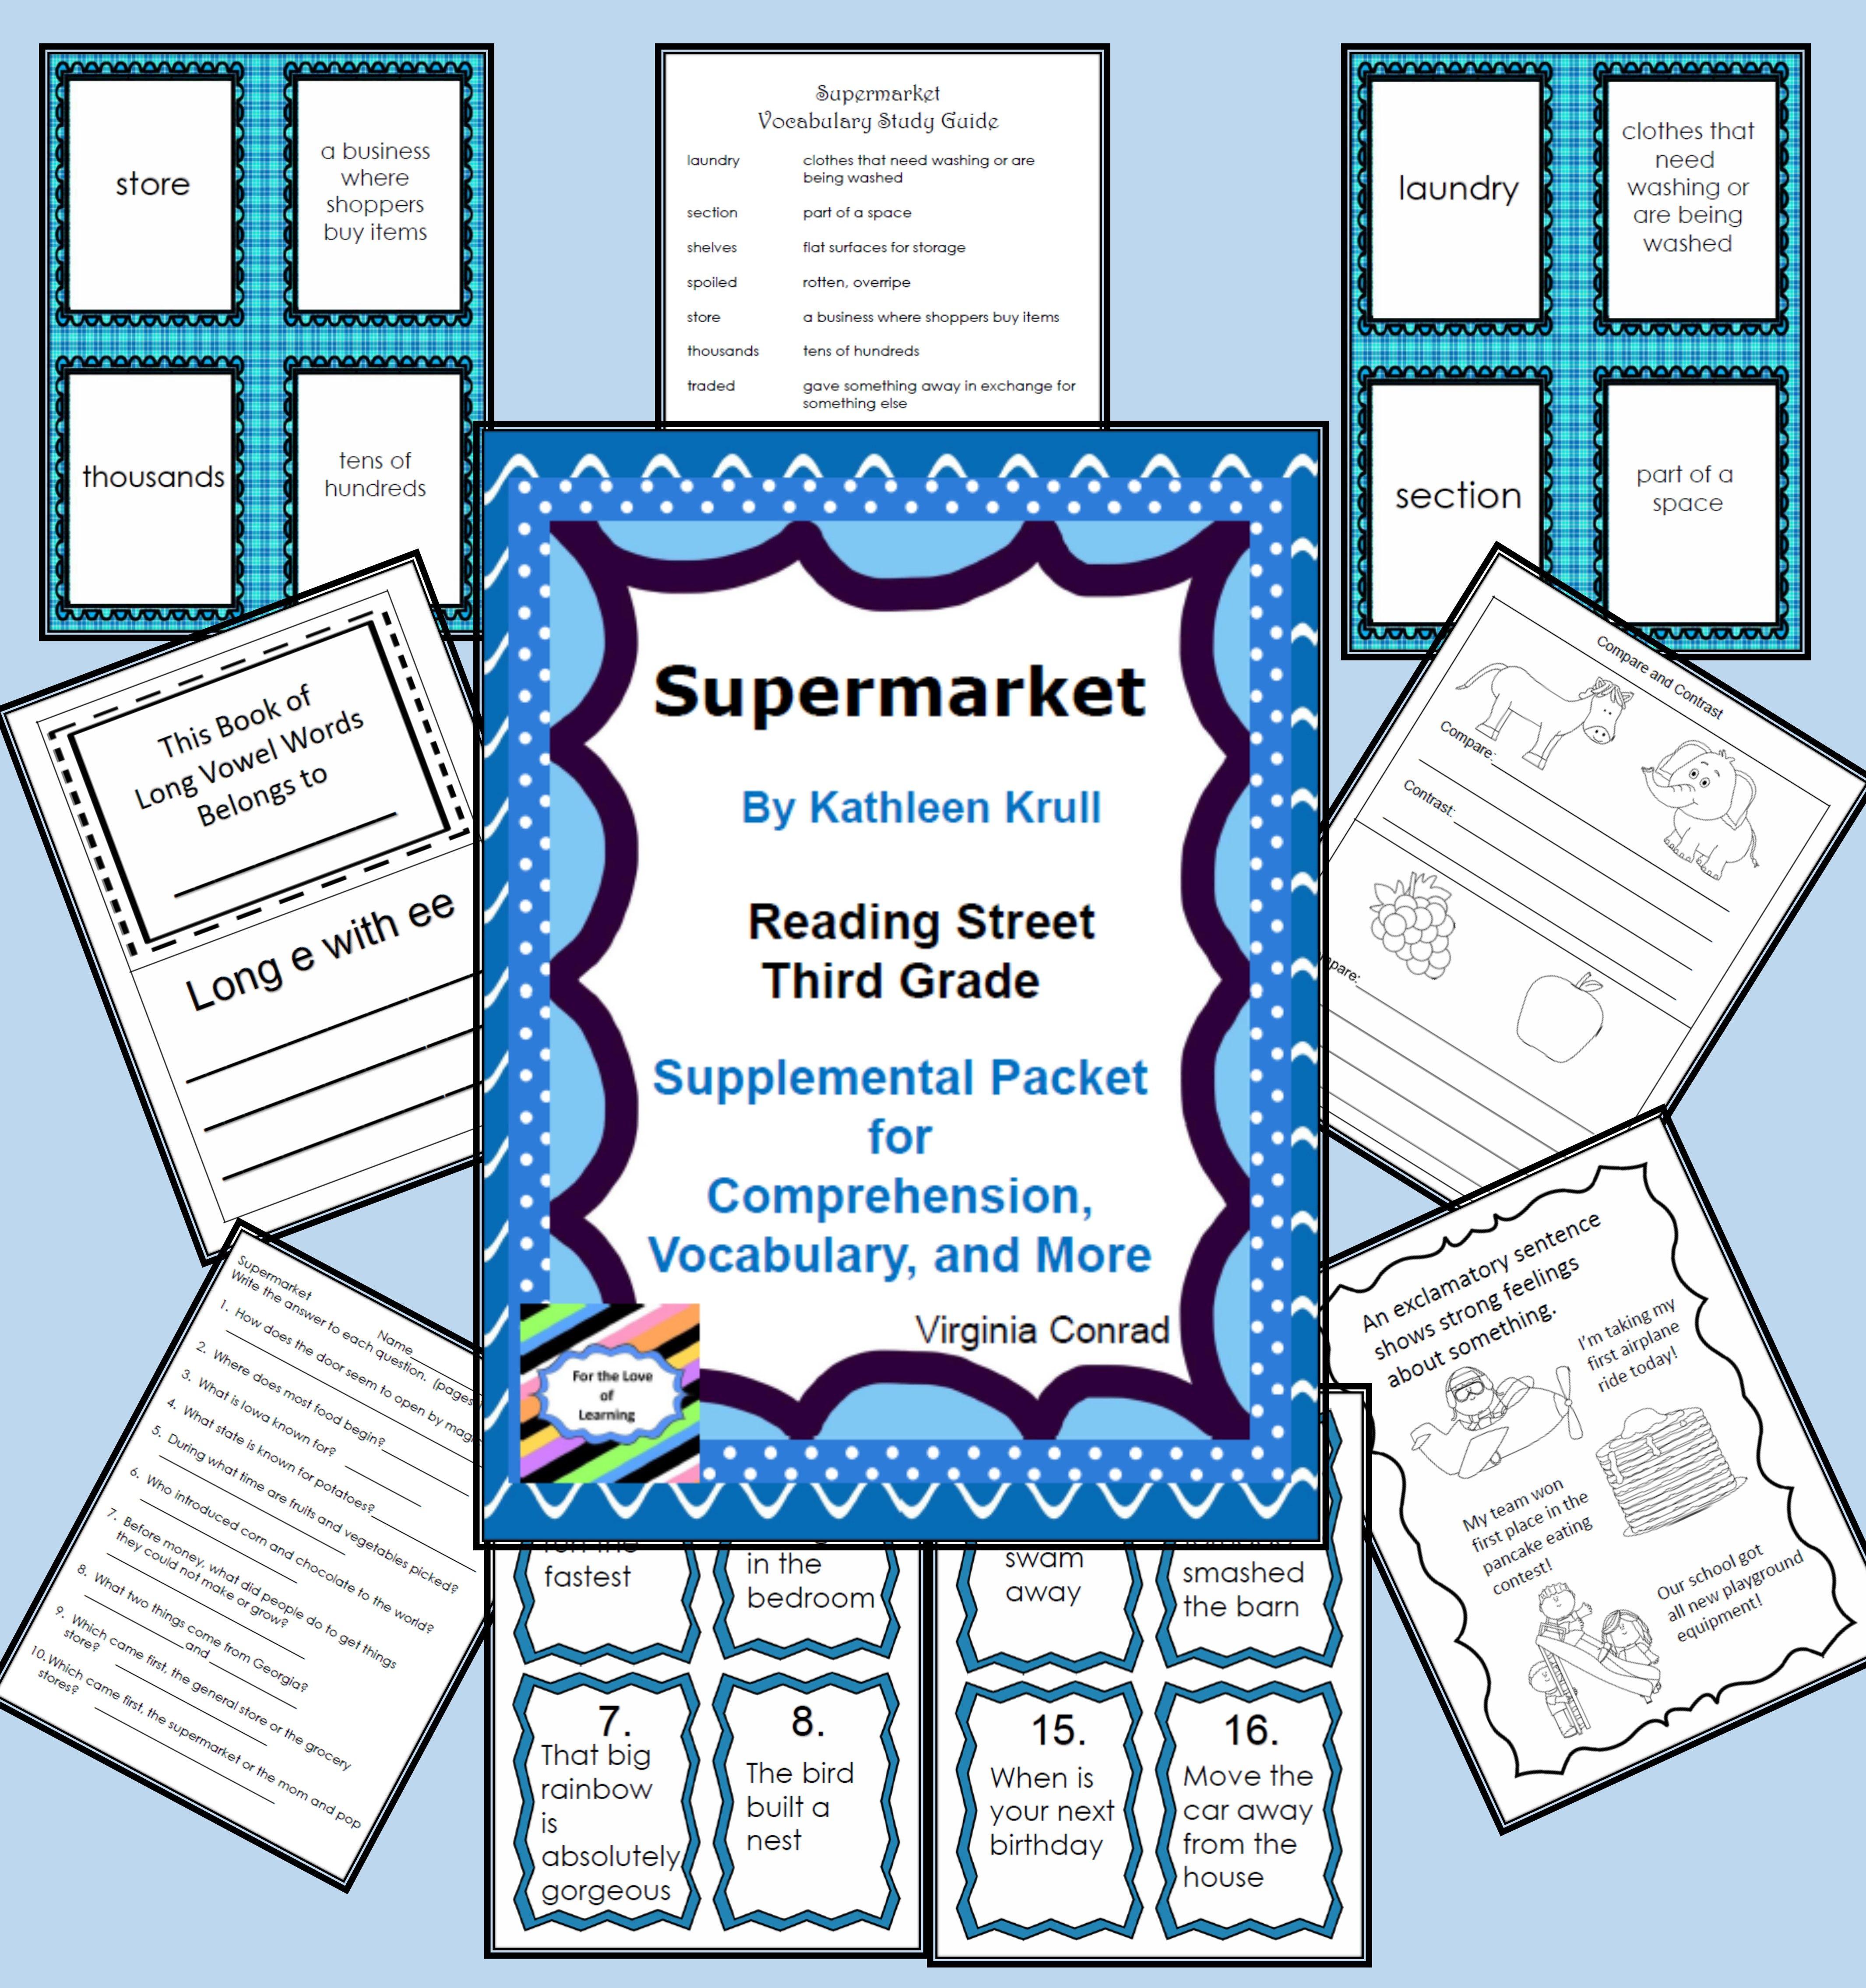 Supermarket Reading Street Supplemental Packet